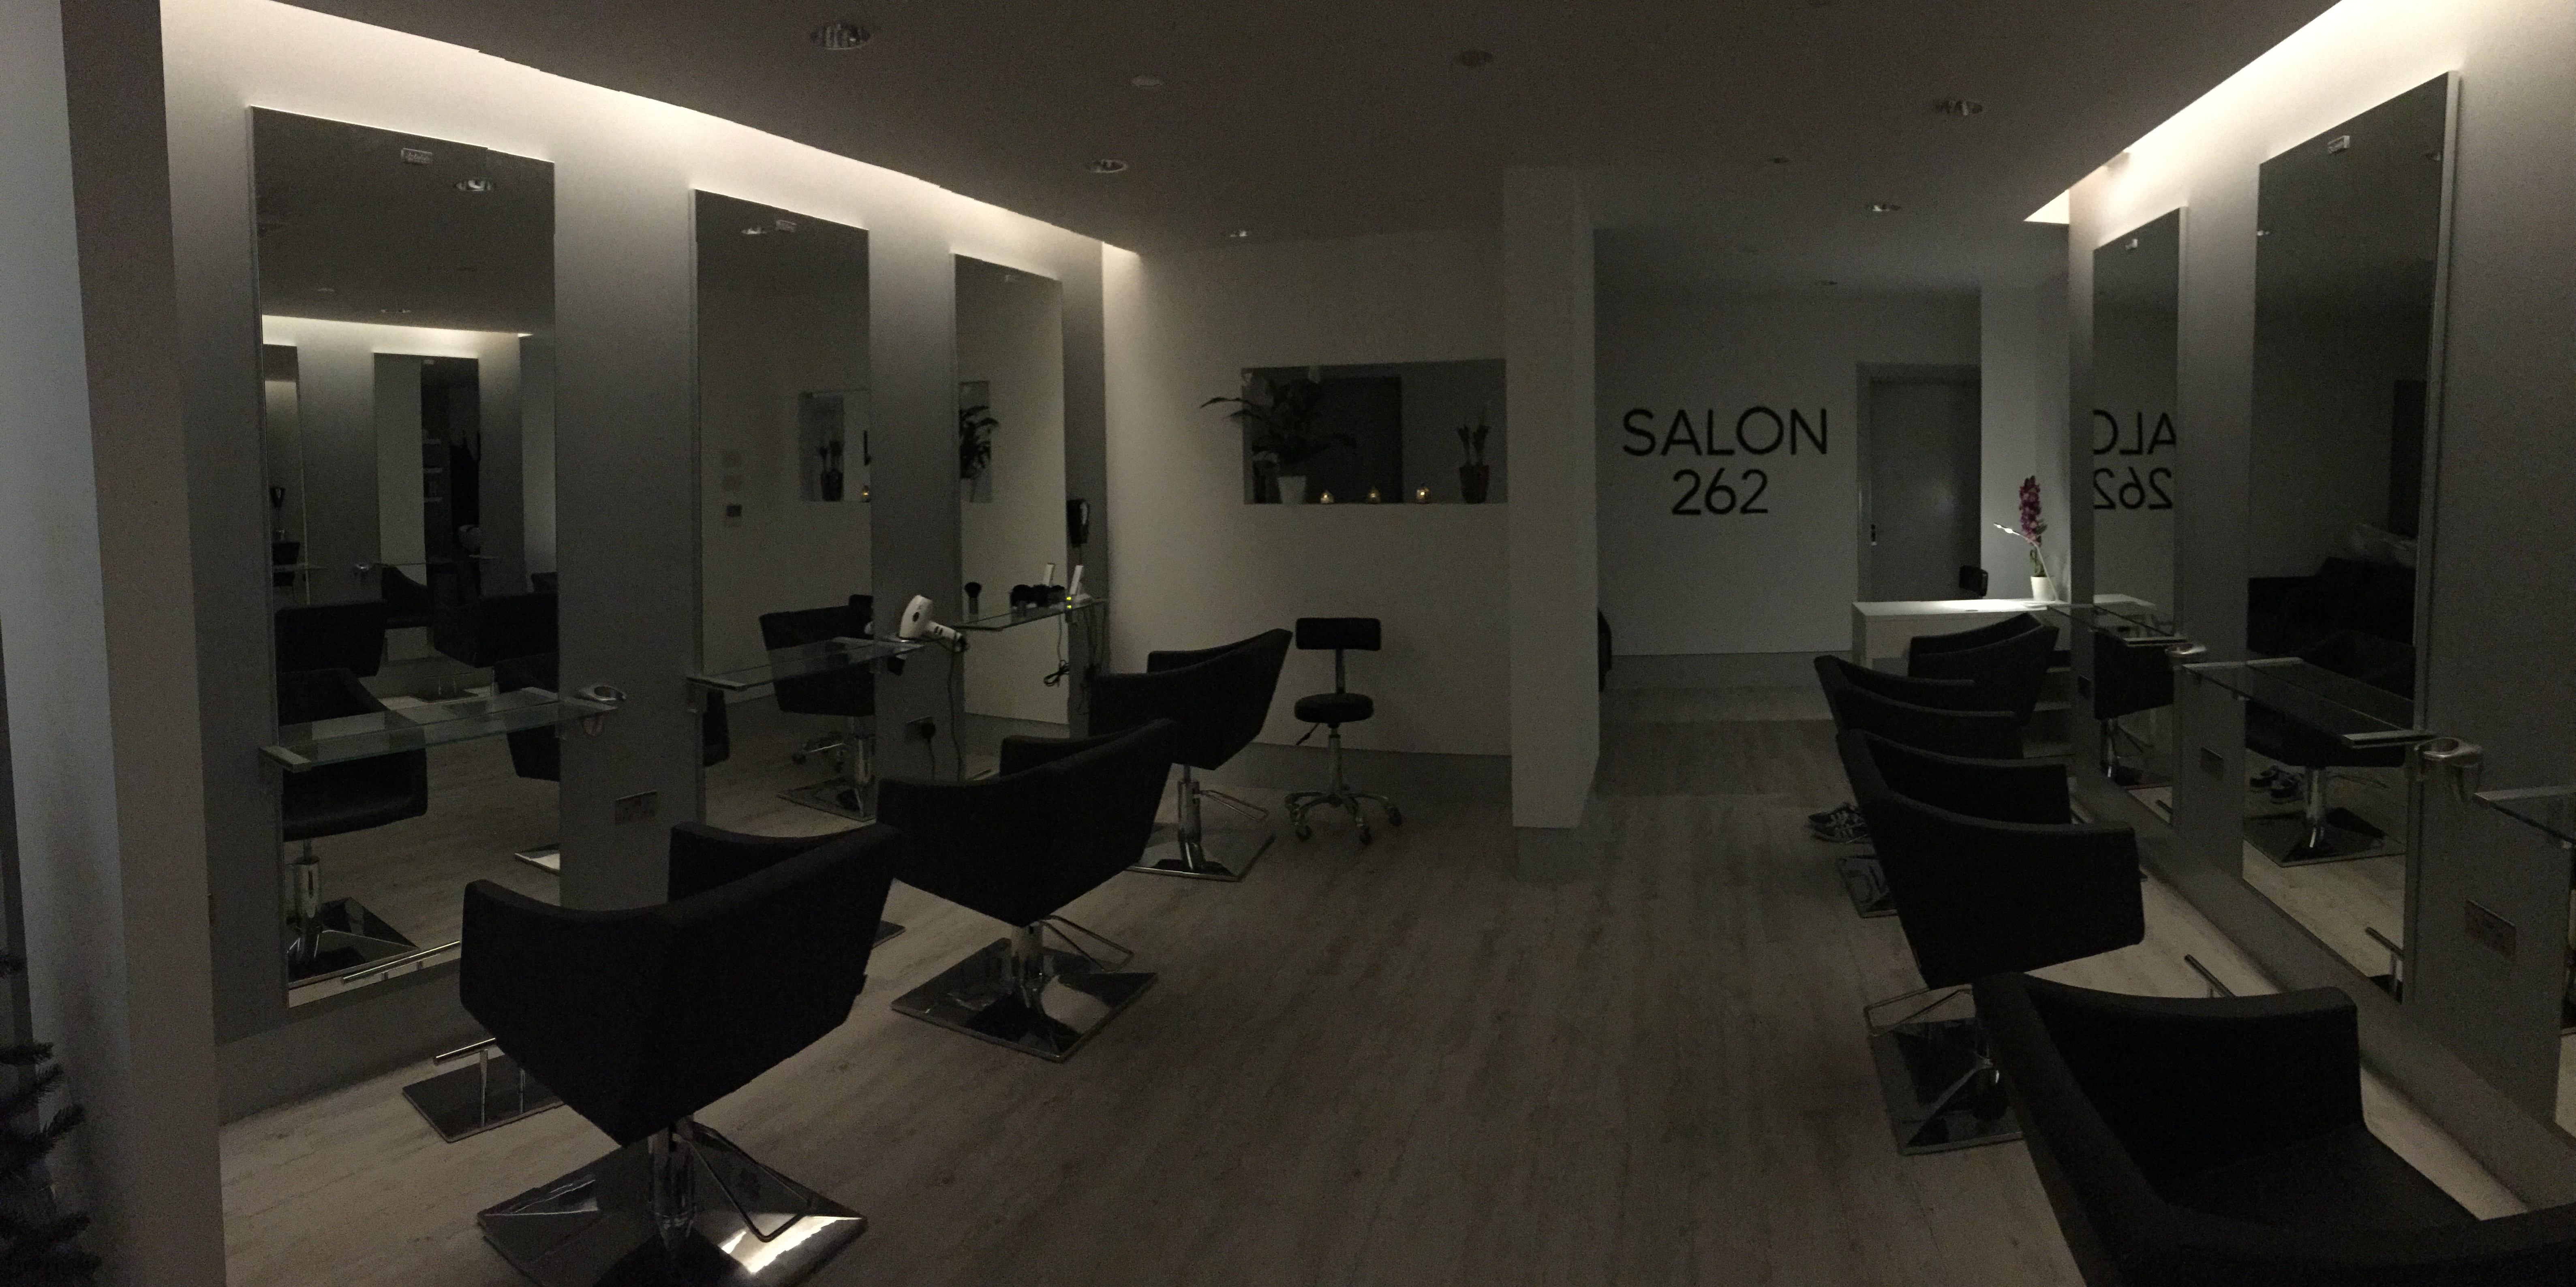 Salon 262